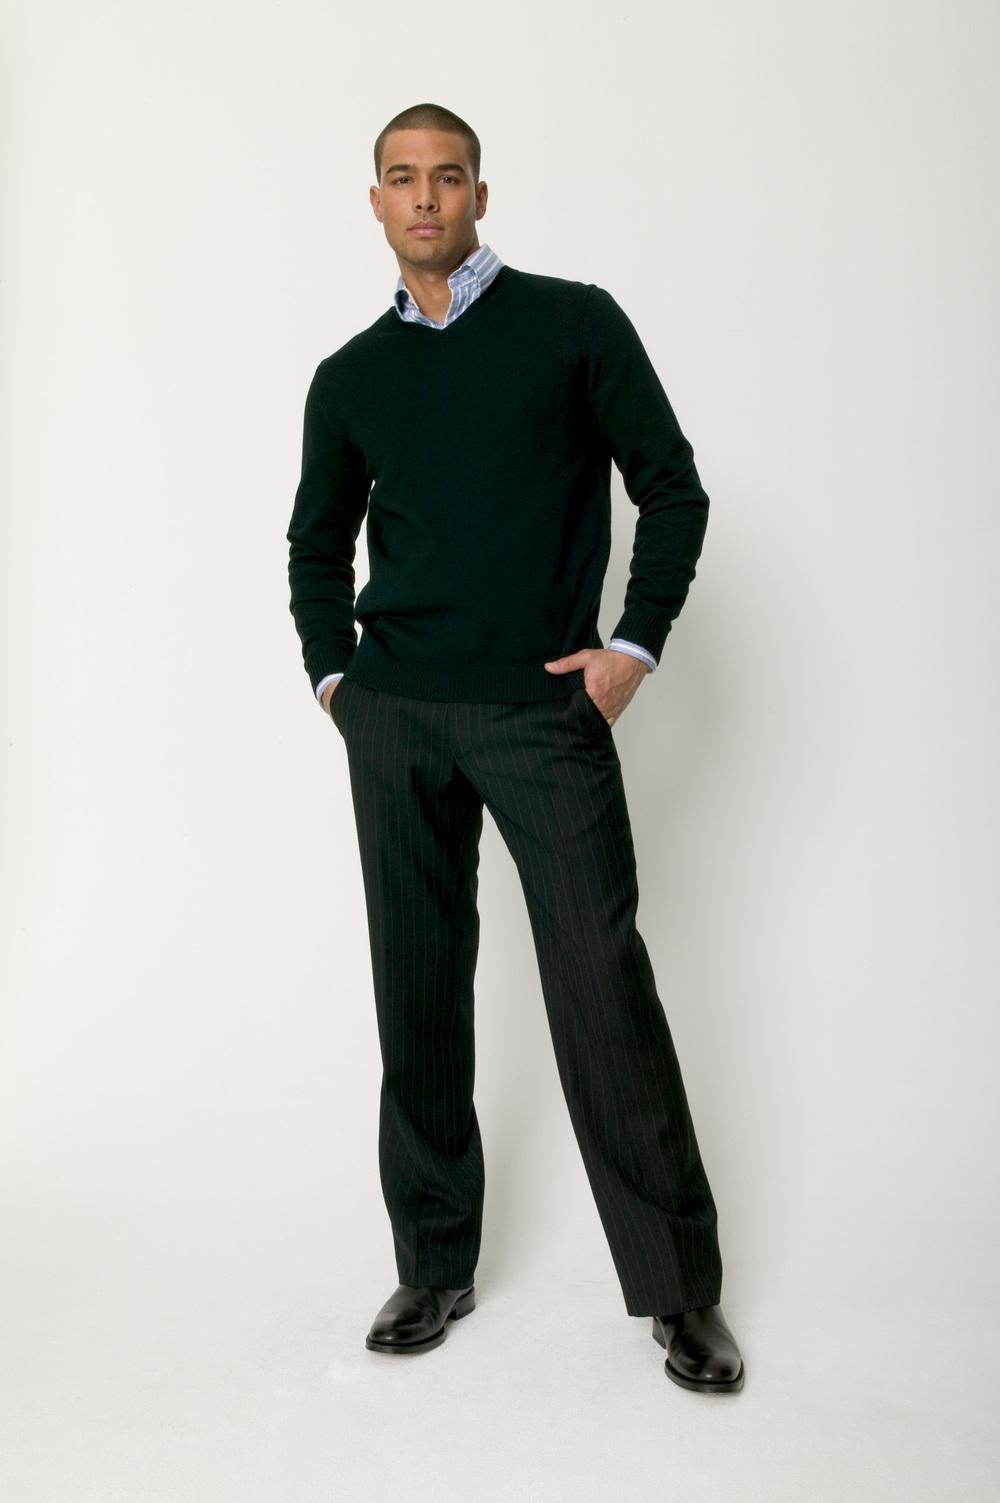 blacksweater_pinstripe-009309.jpg